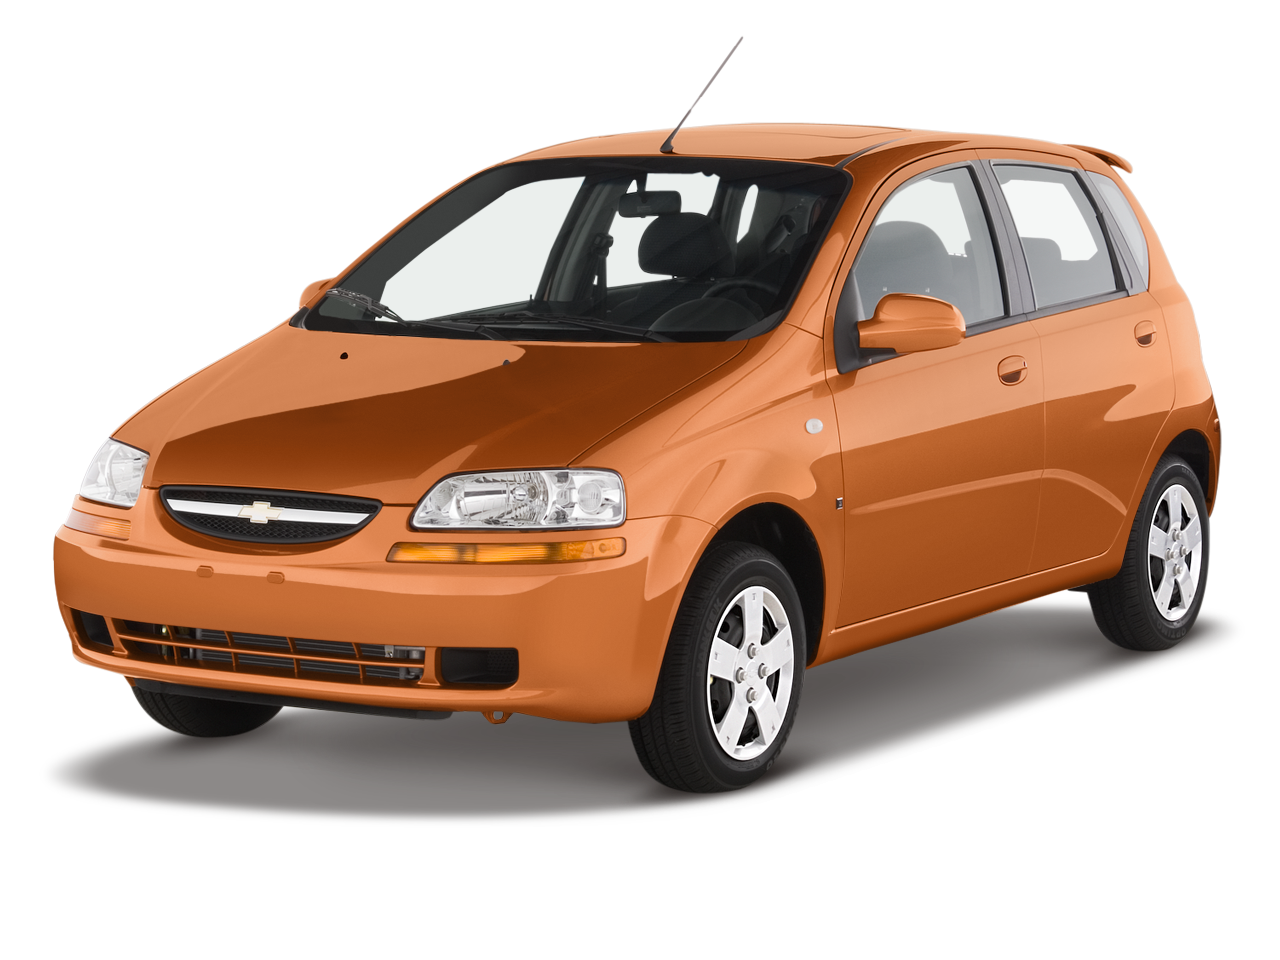 2007 Chevrolet Aveo - 2006 Detroit Auto Show